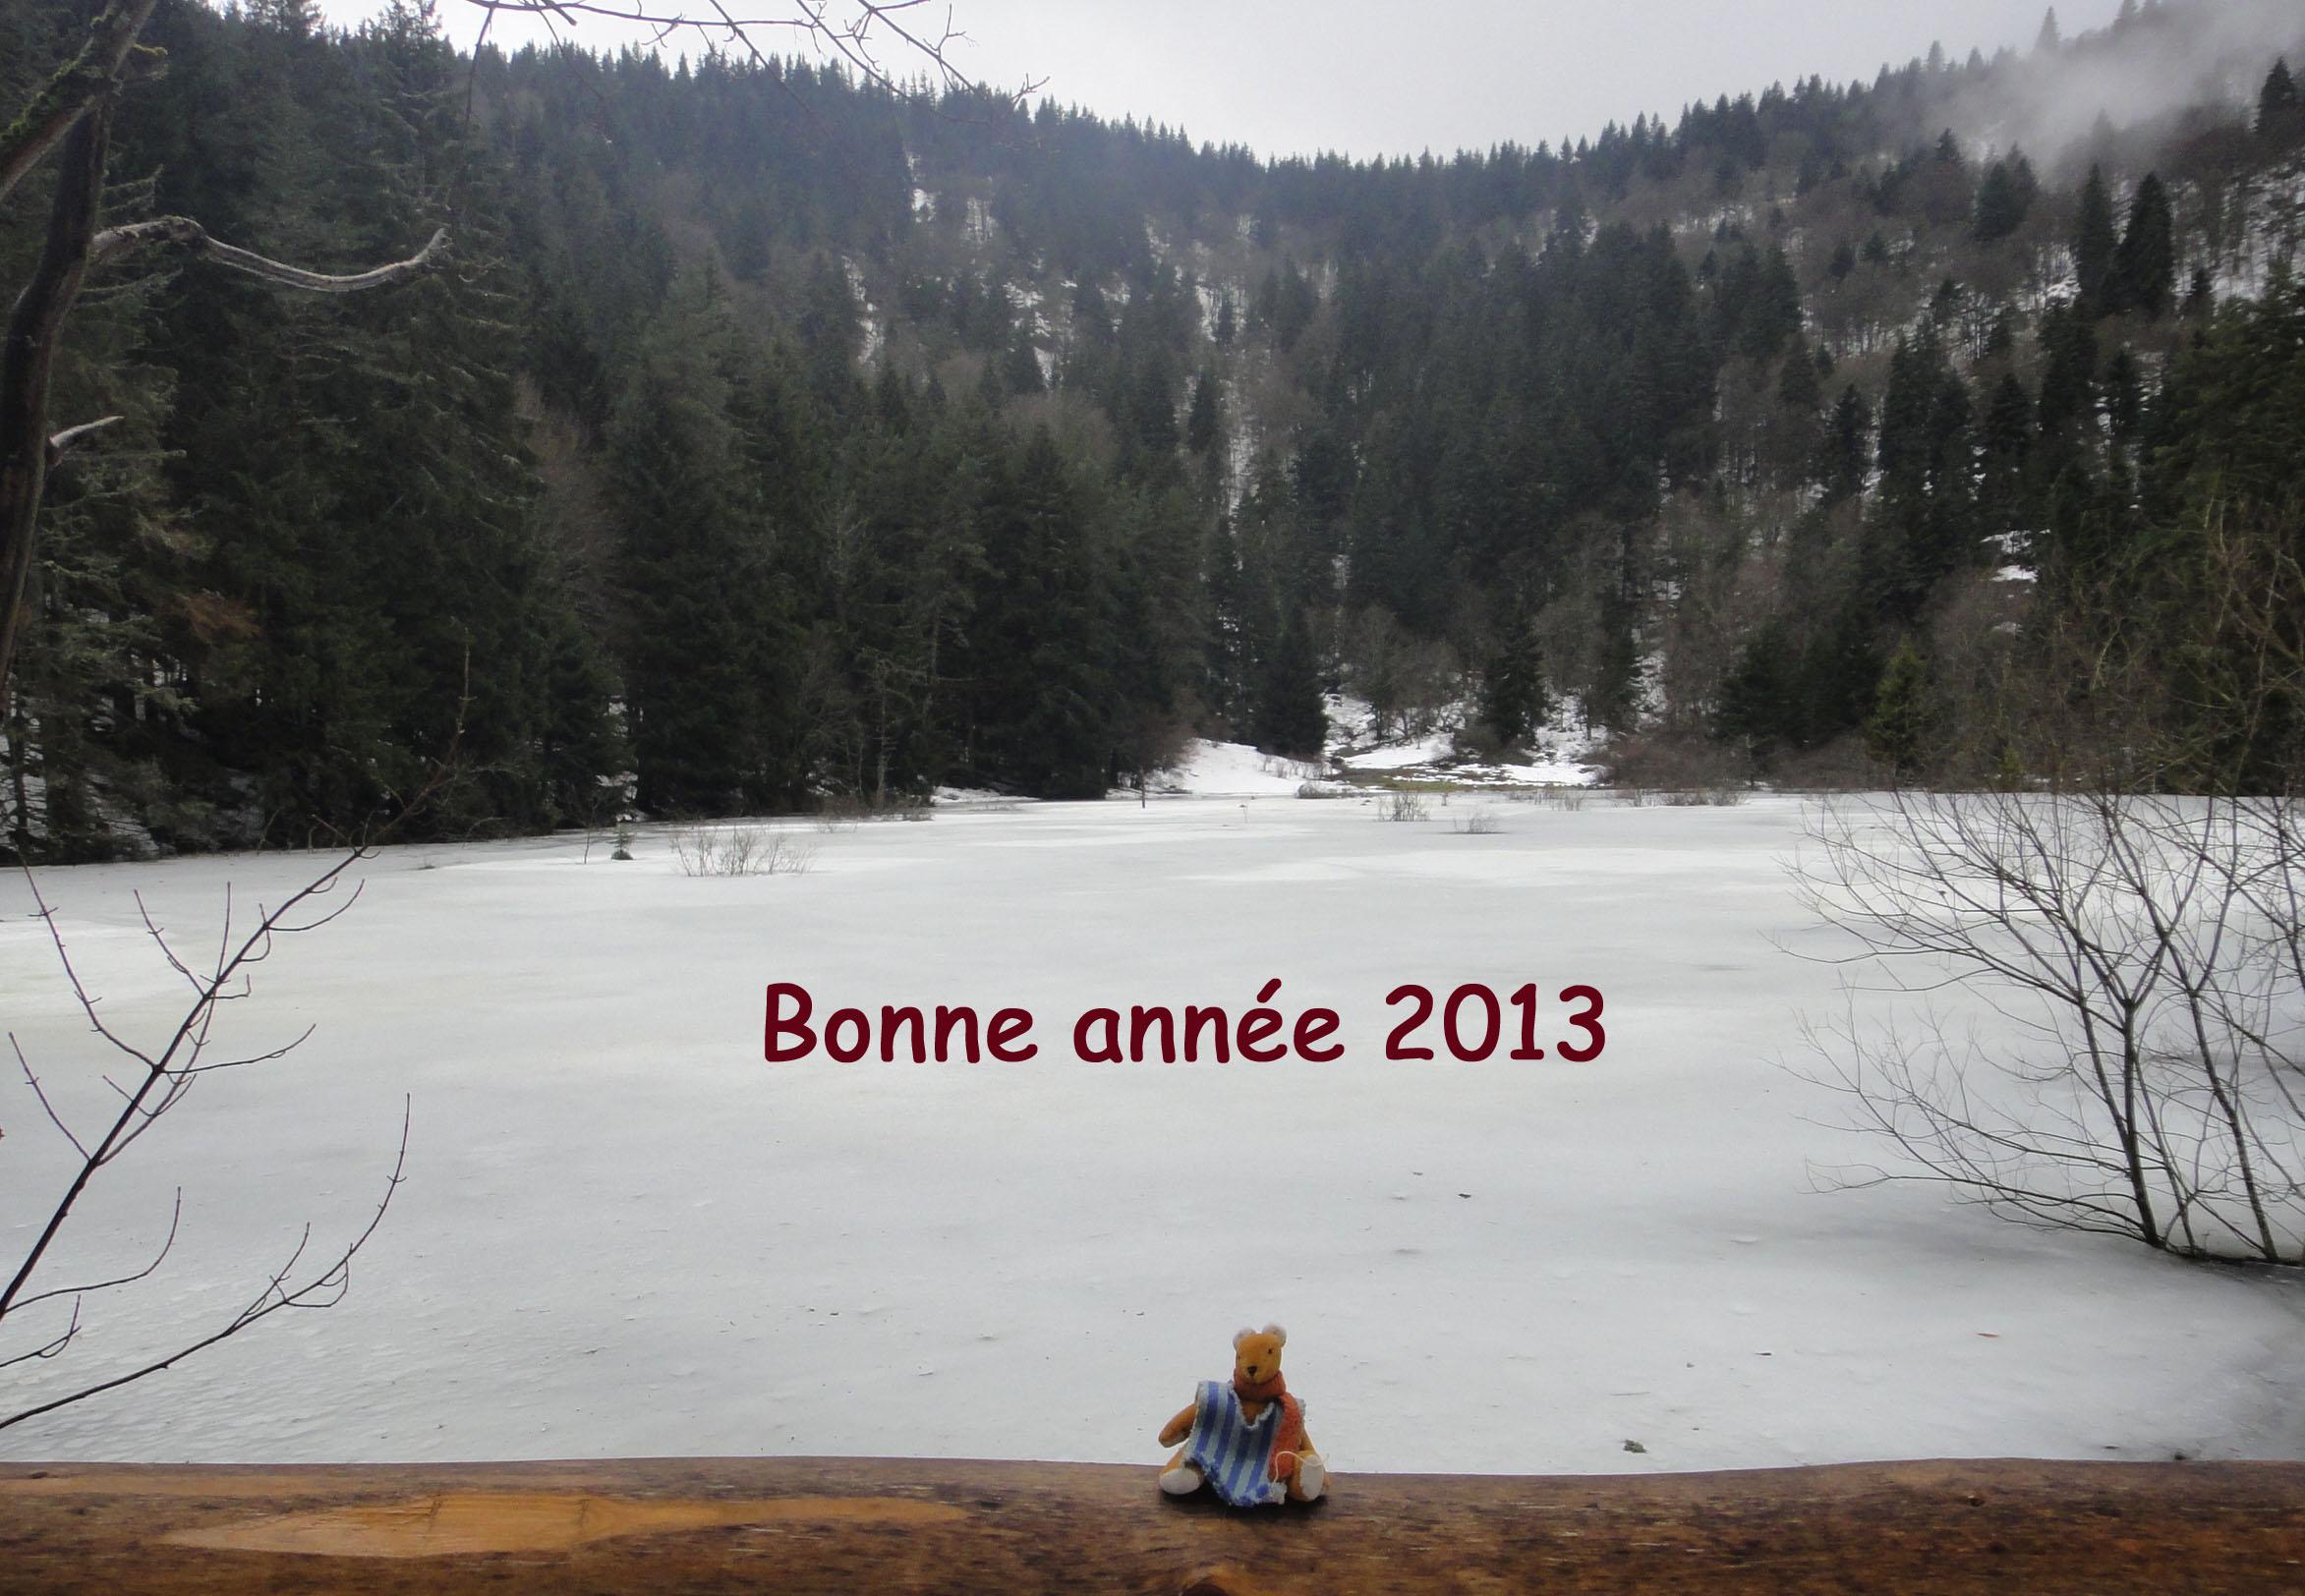 http://spiderphat.free.fr/Antoine/Perou/bonne%20ann%C3%A9e%20Antoine.jpg